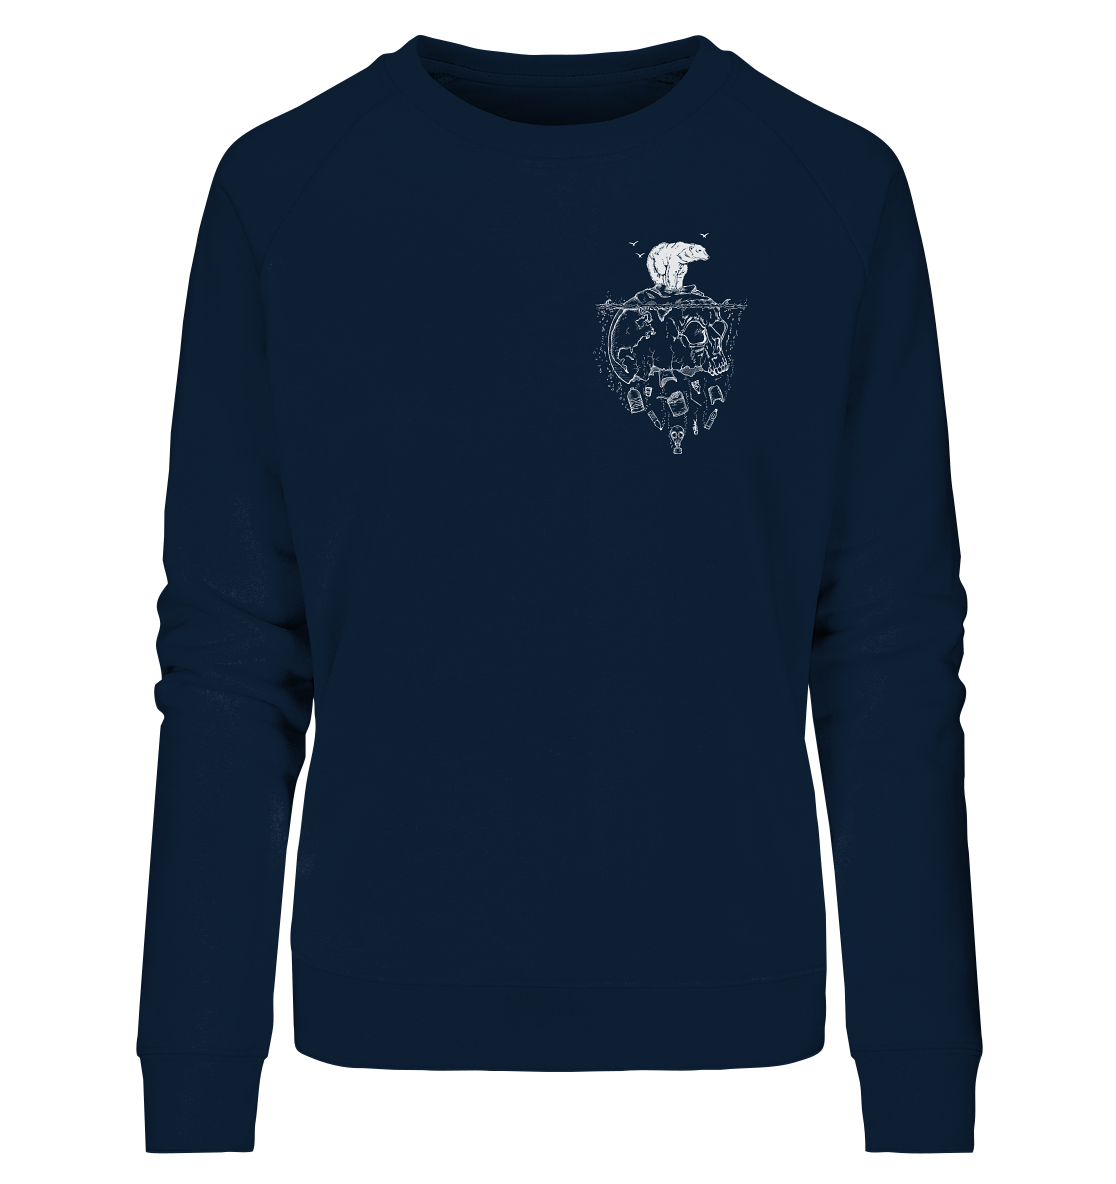 front-ladies-organic-sweatshirt-0e2035-1116x-16.png